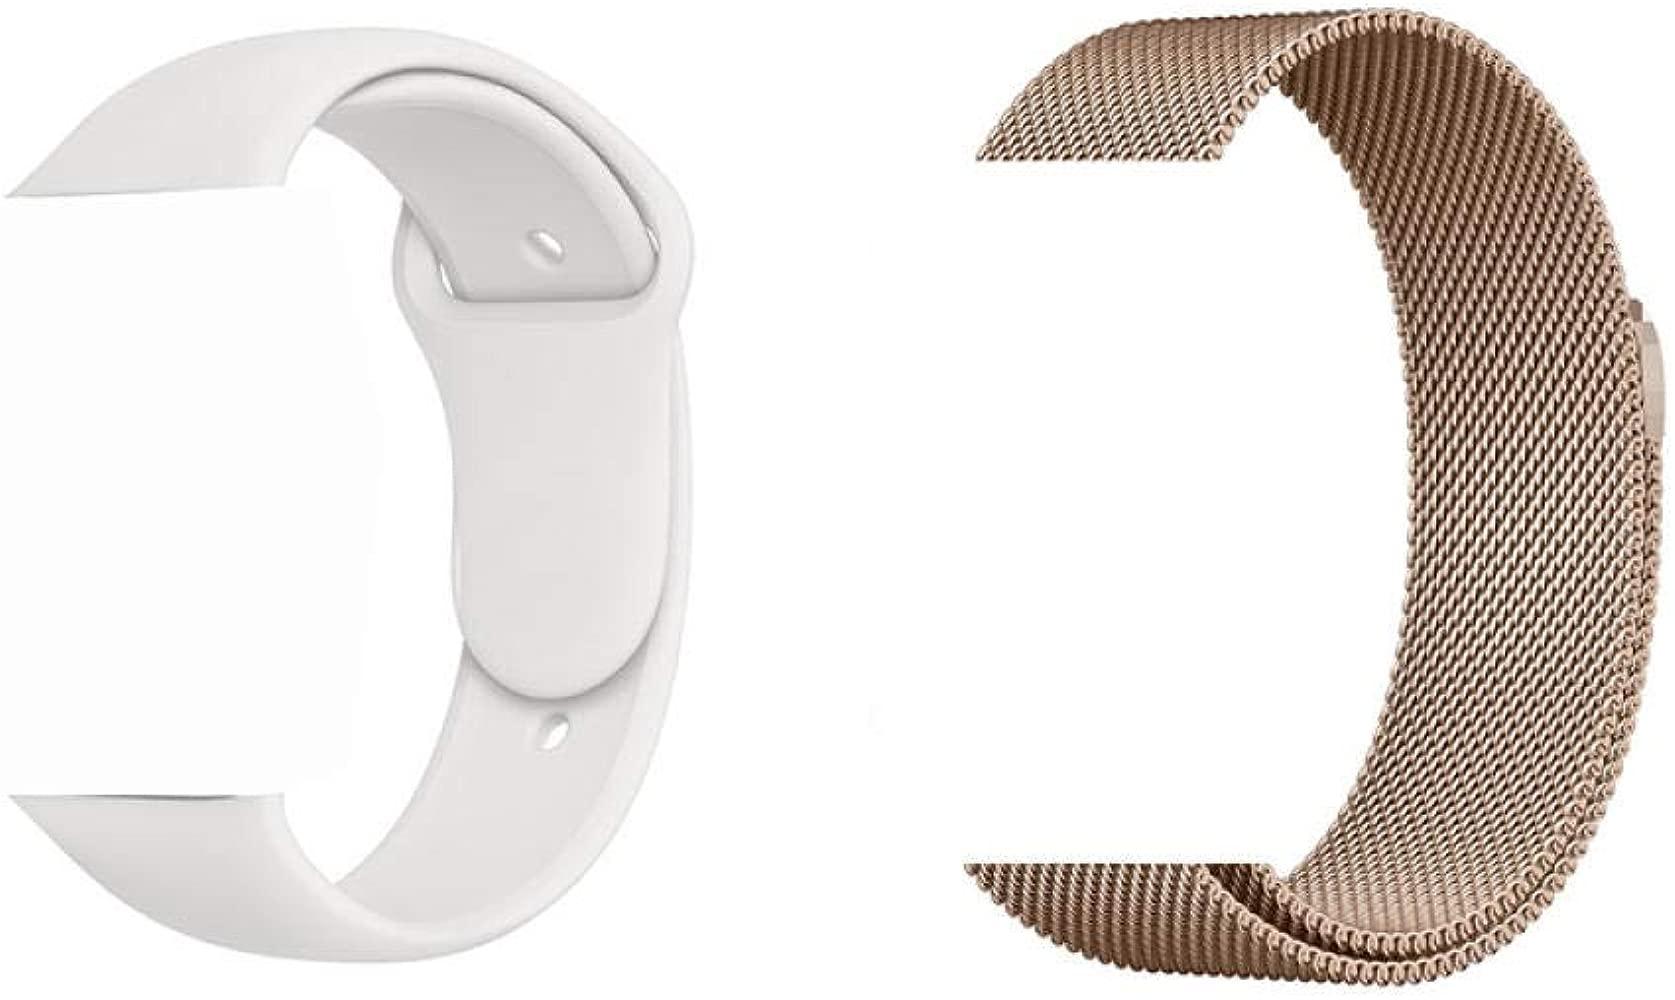 Relojes Inteligentes Iwo 8 Smart Watch Series 4 Men Iwo8 Relogio ...